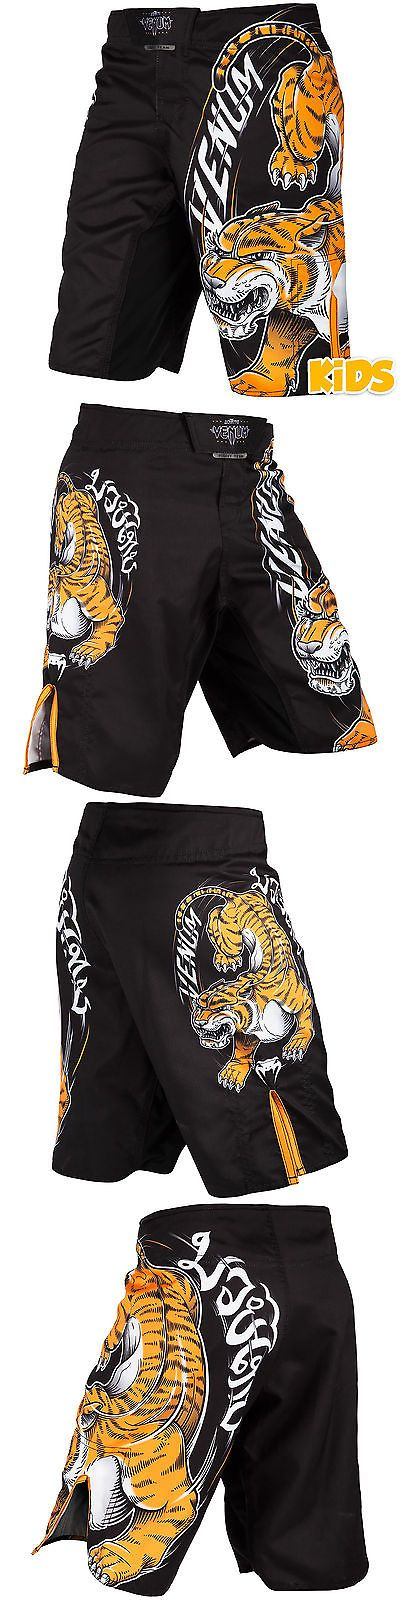 Shorts 73982: Venum Tiger King Kids Fight Shorts -> BUY IT NOW ONLY: $34.99 on eBay!